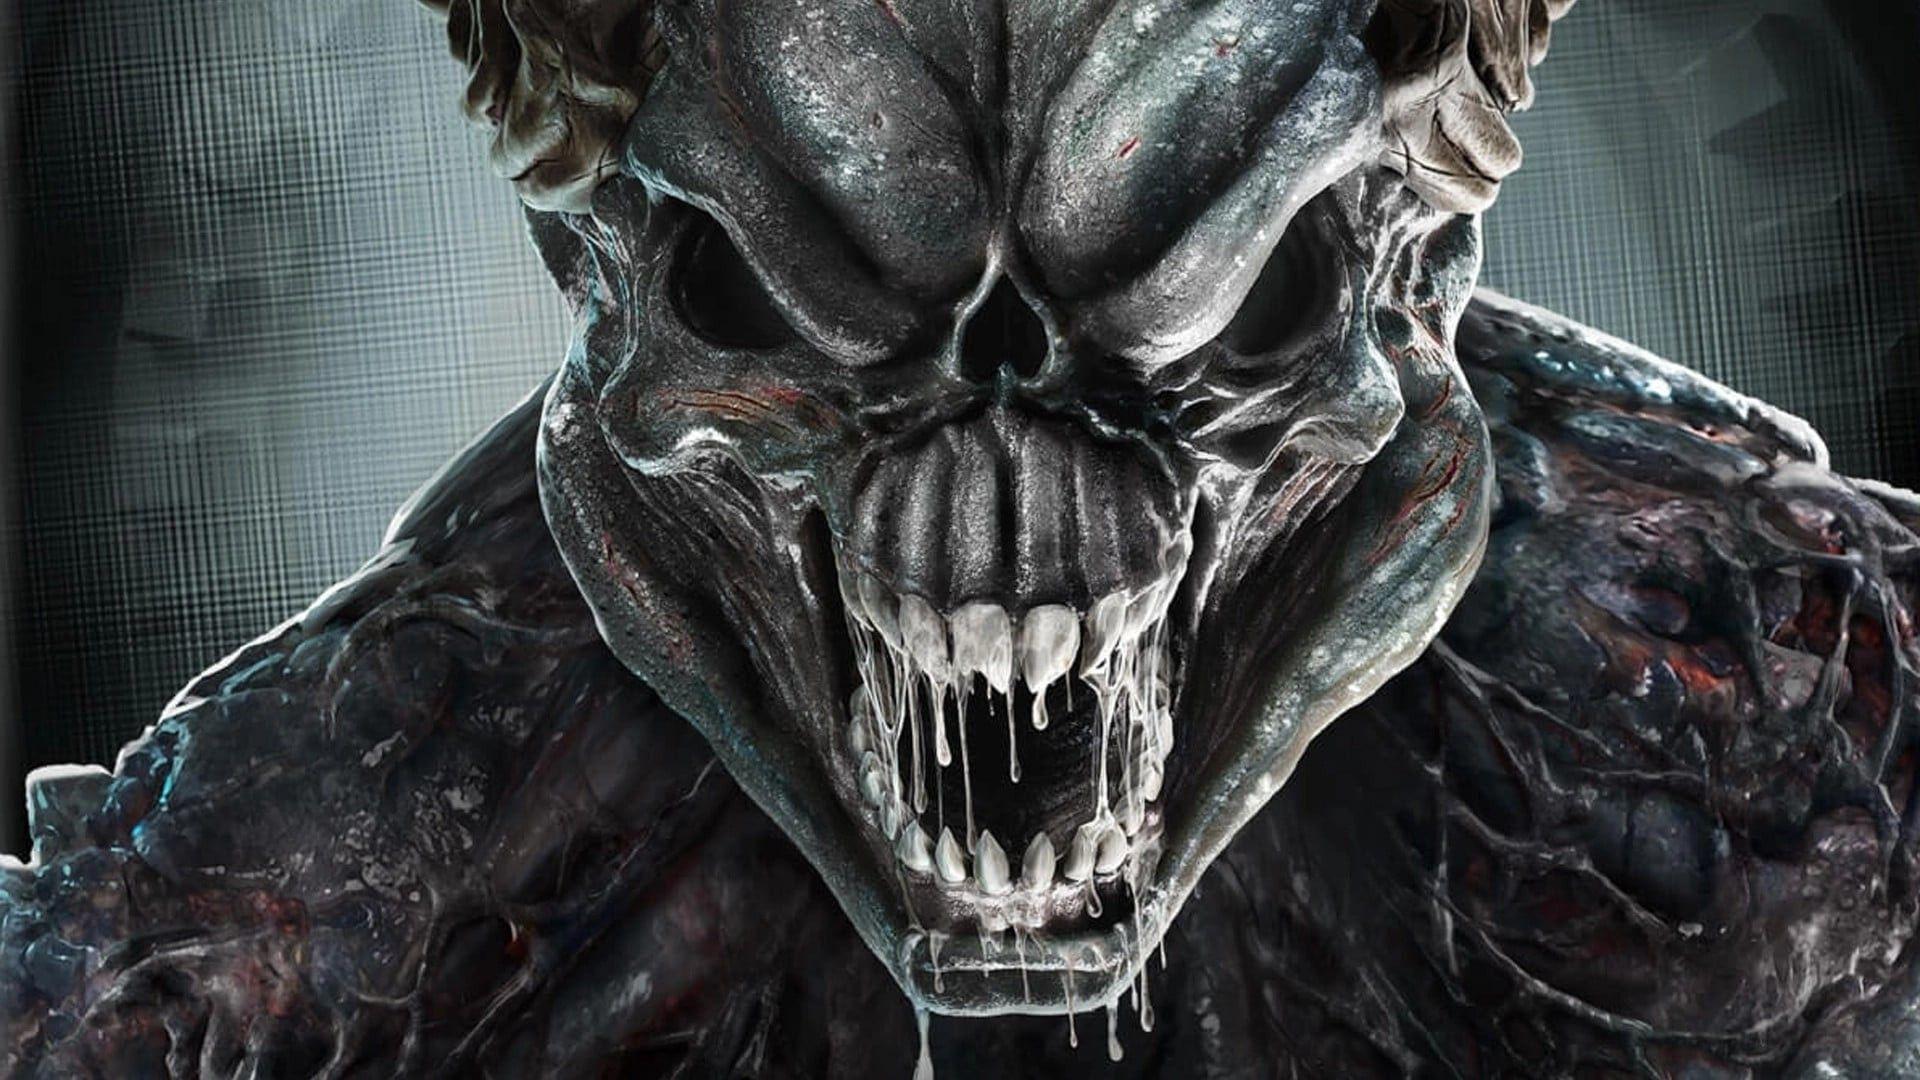 Doom Annihilation Doom Movies The New Mutants